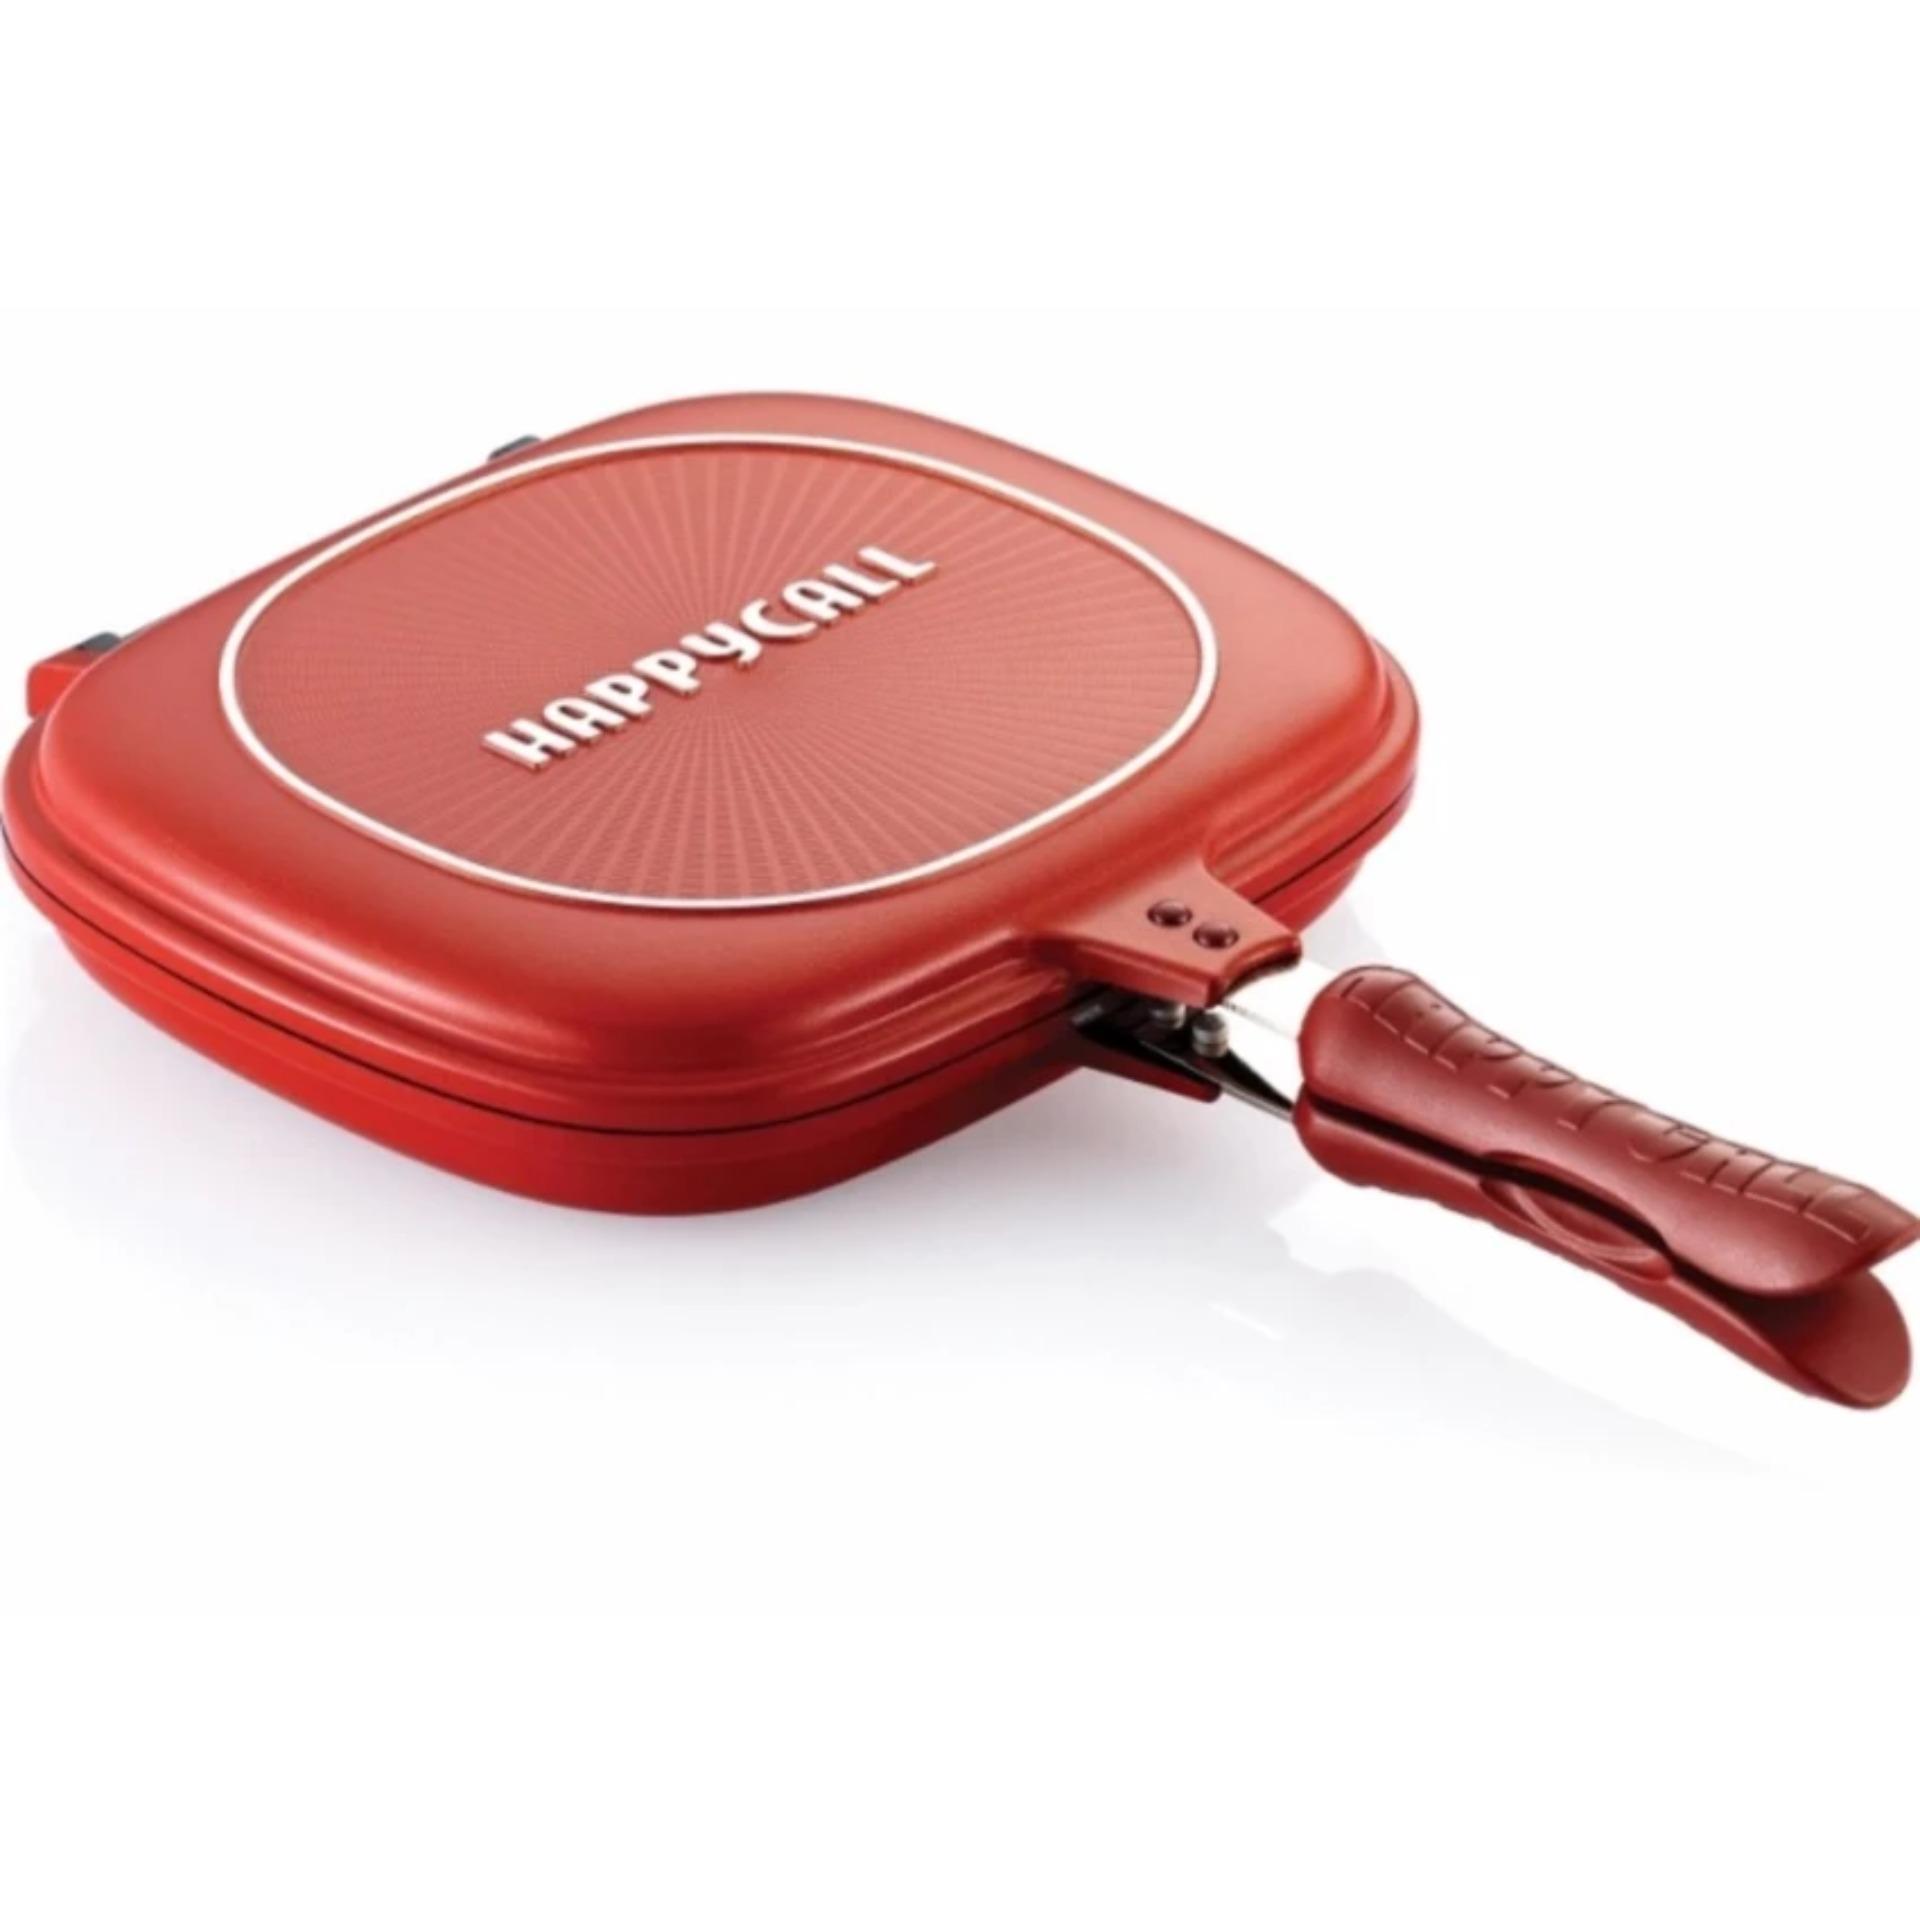 Home-Klik Double Pan - 32 cm - Merah